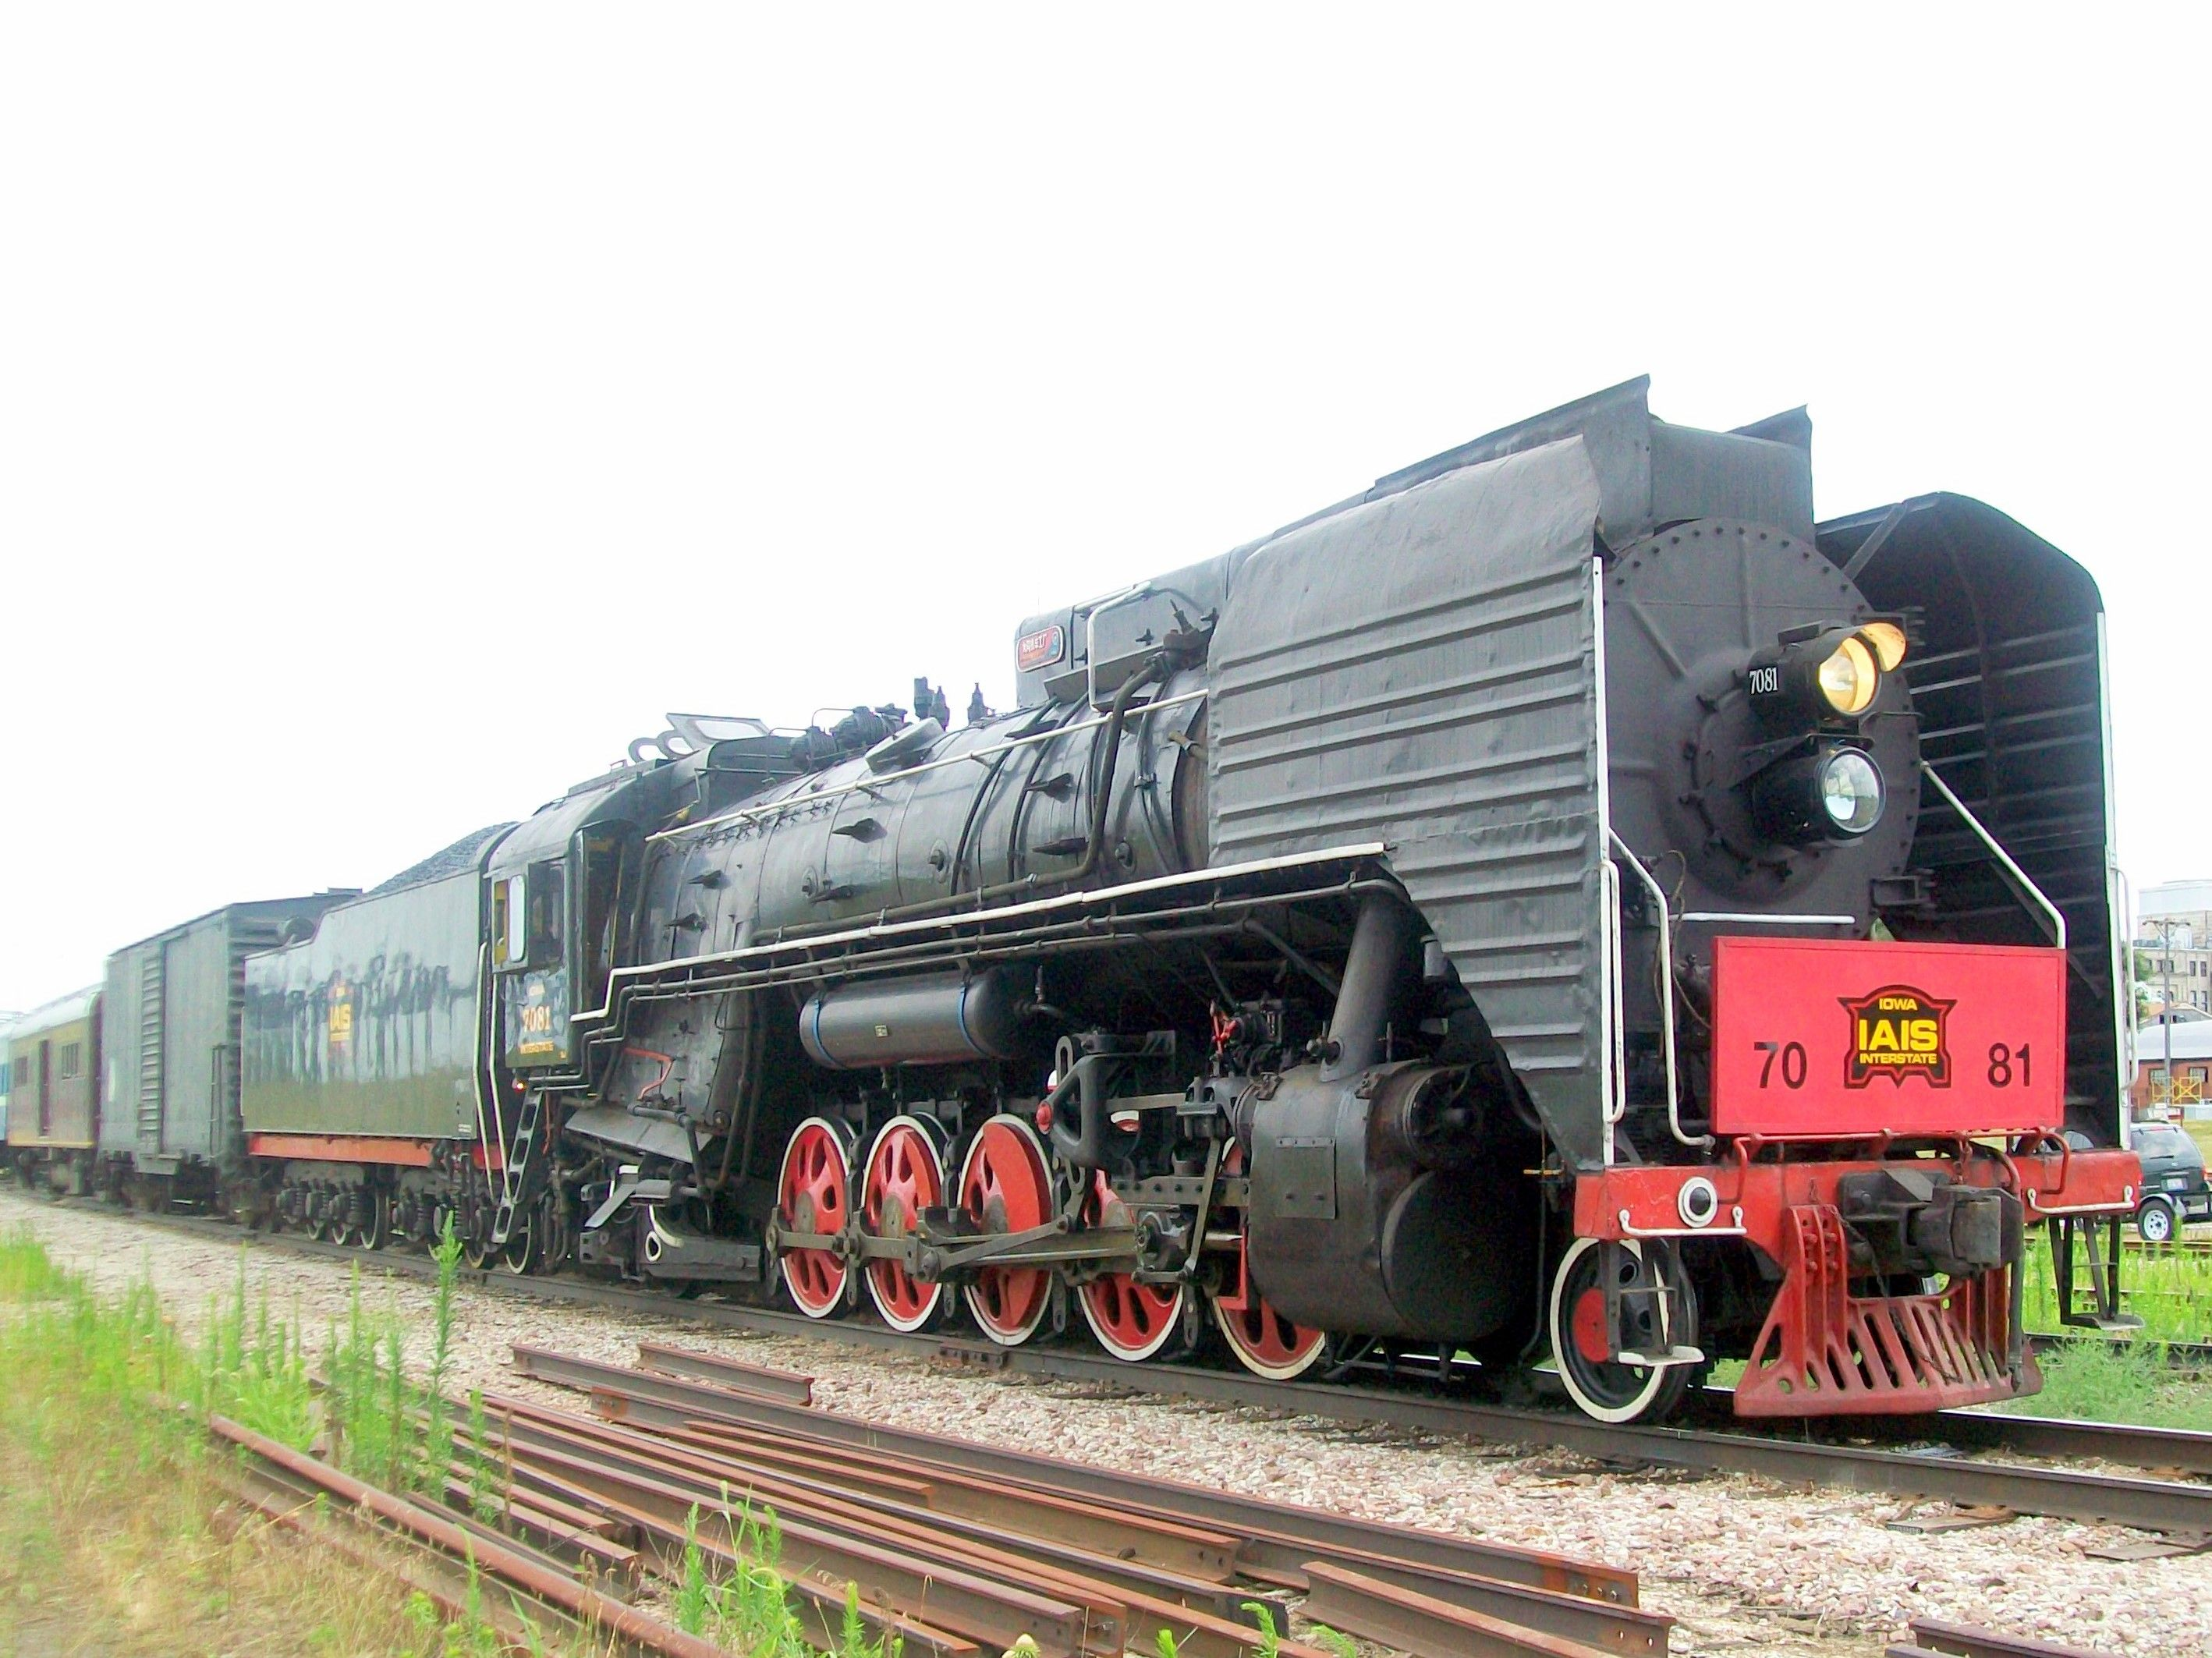 Chinese made steam locomotive on Iowa Interstate railroad